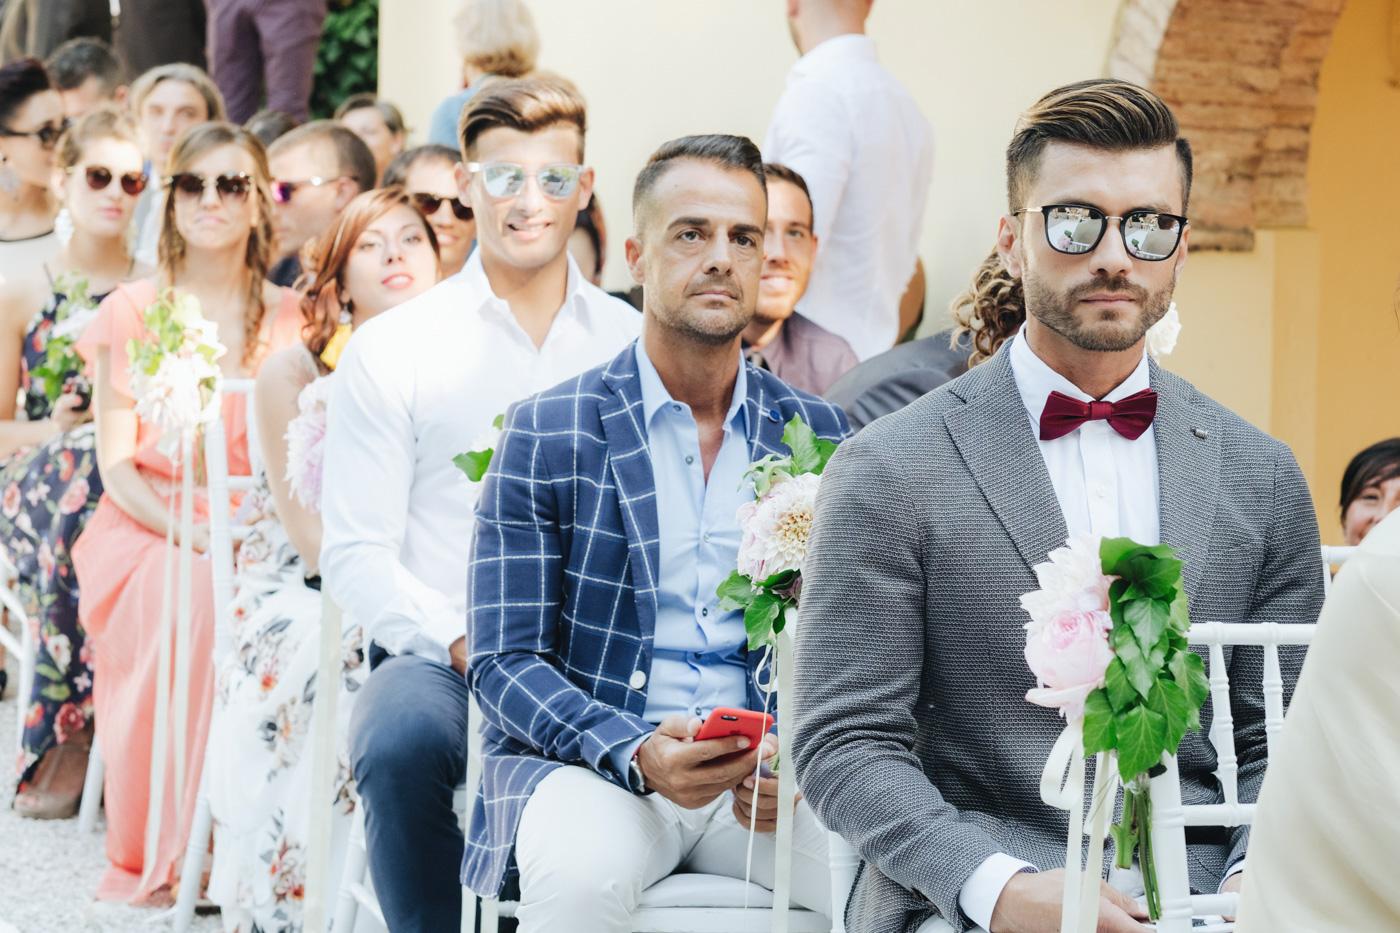 Matrimoni all'italiana wedding photographer italy-48.jpg